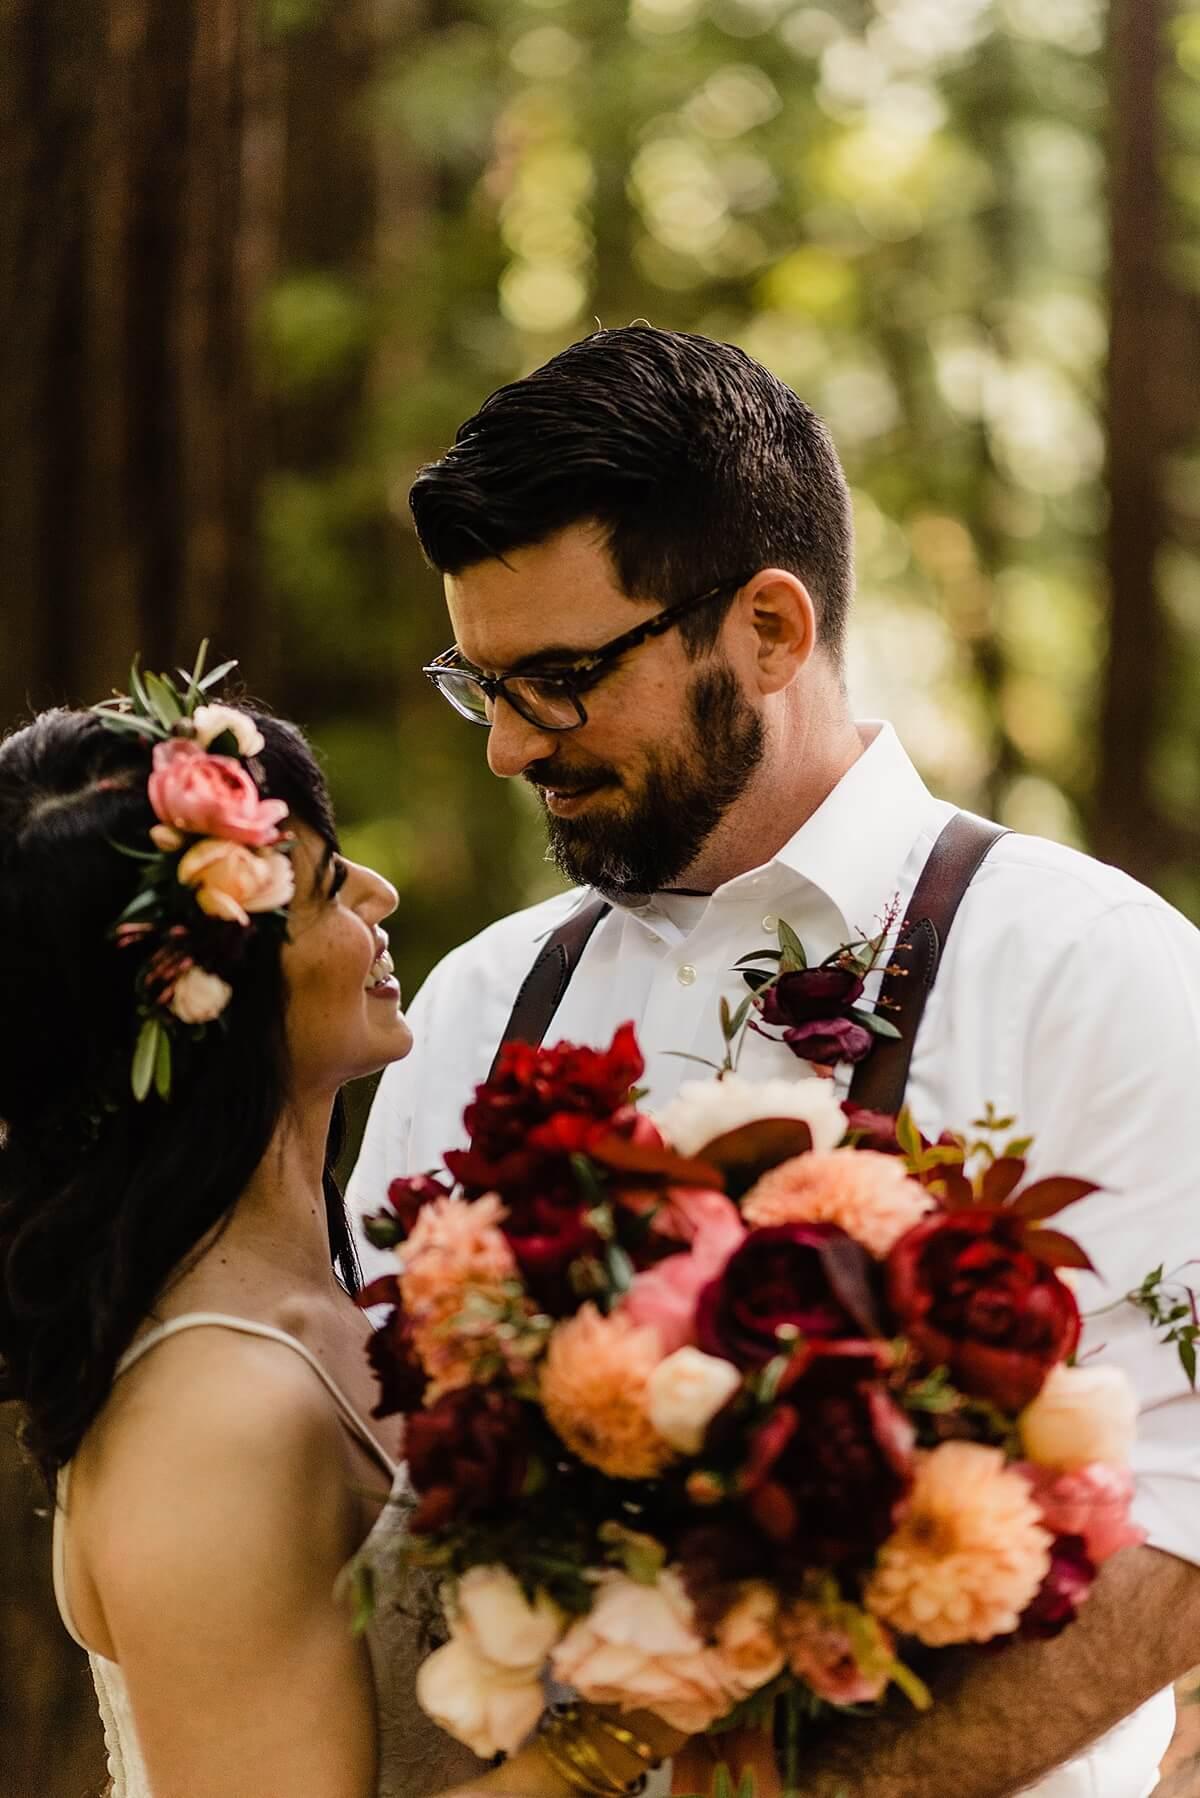 Allison-Brooks-Jedediah-Smiith-Redwoods-Adventure-Elopement-Wedding-S-Photography-Blog_0012.jpg